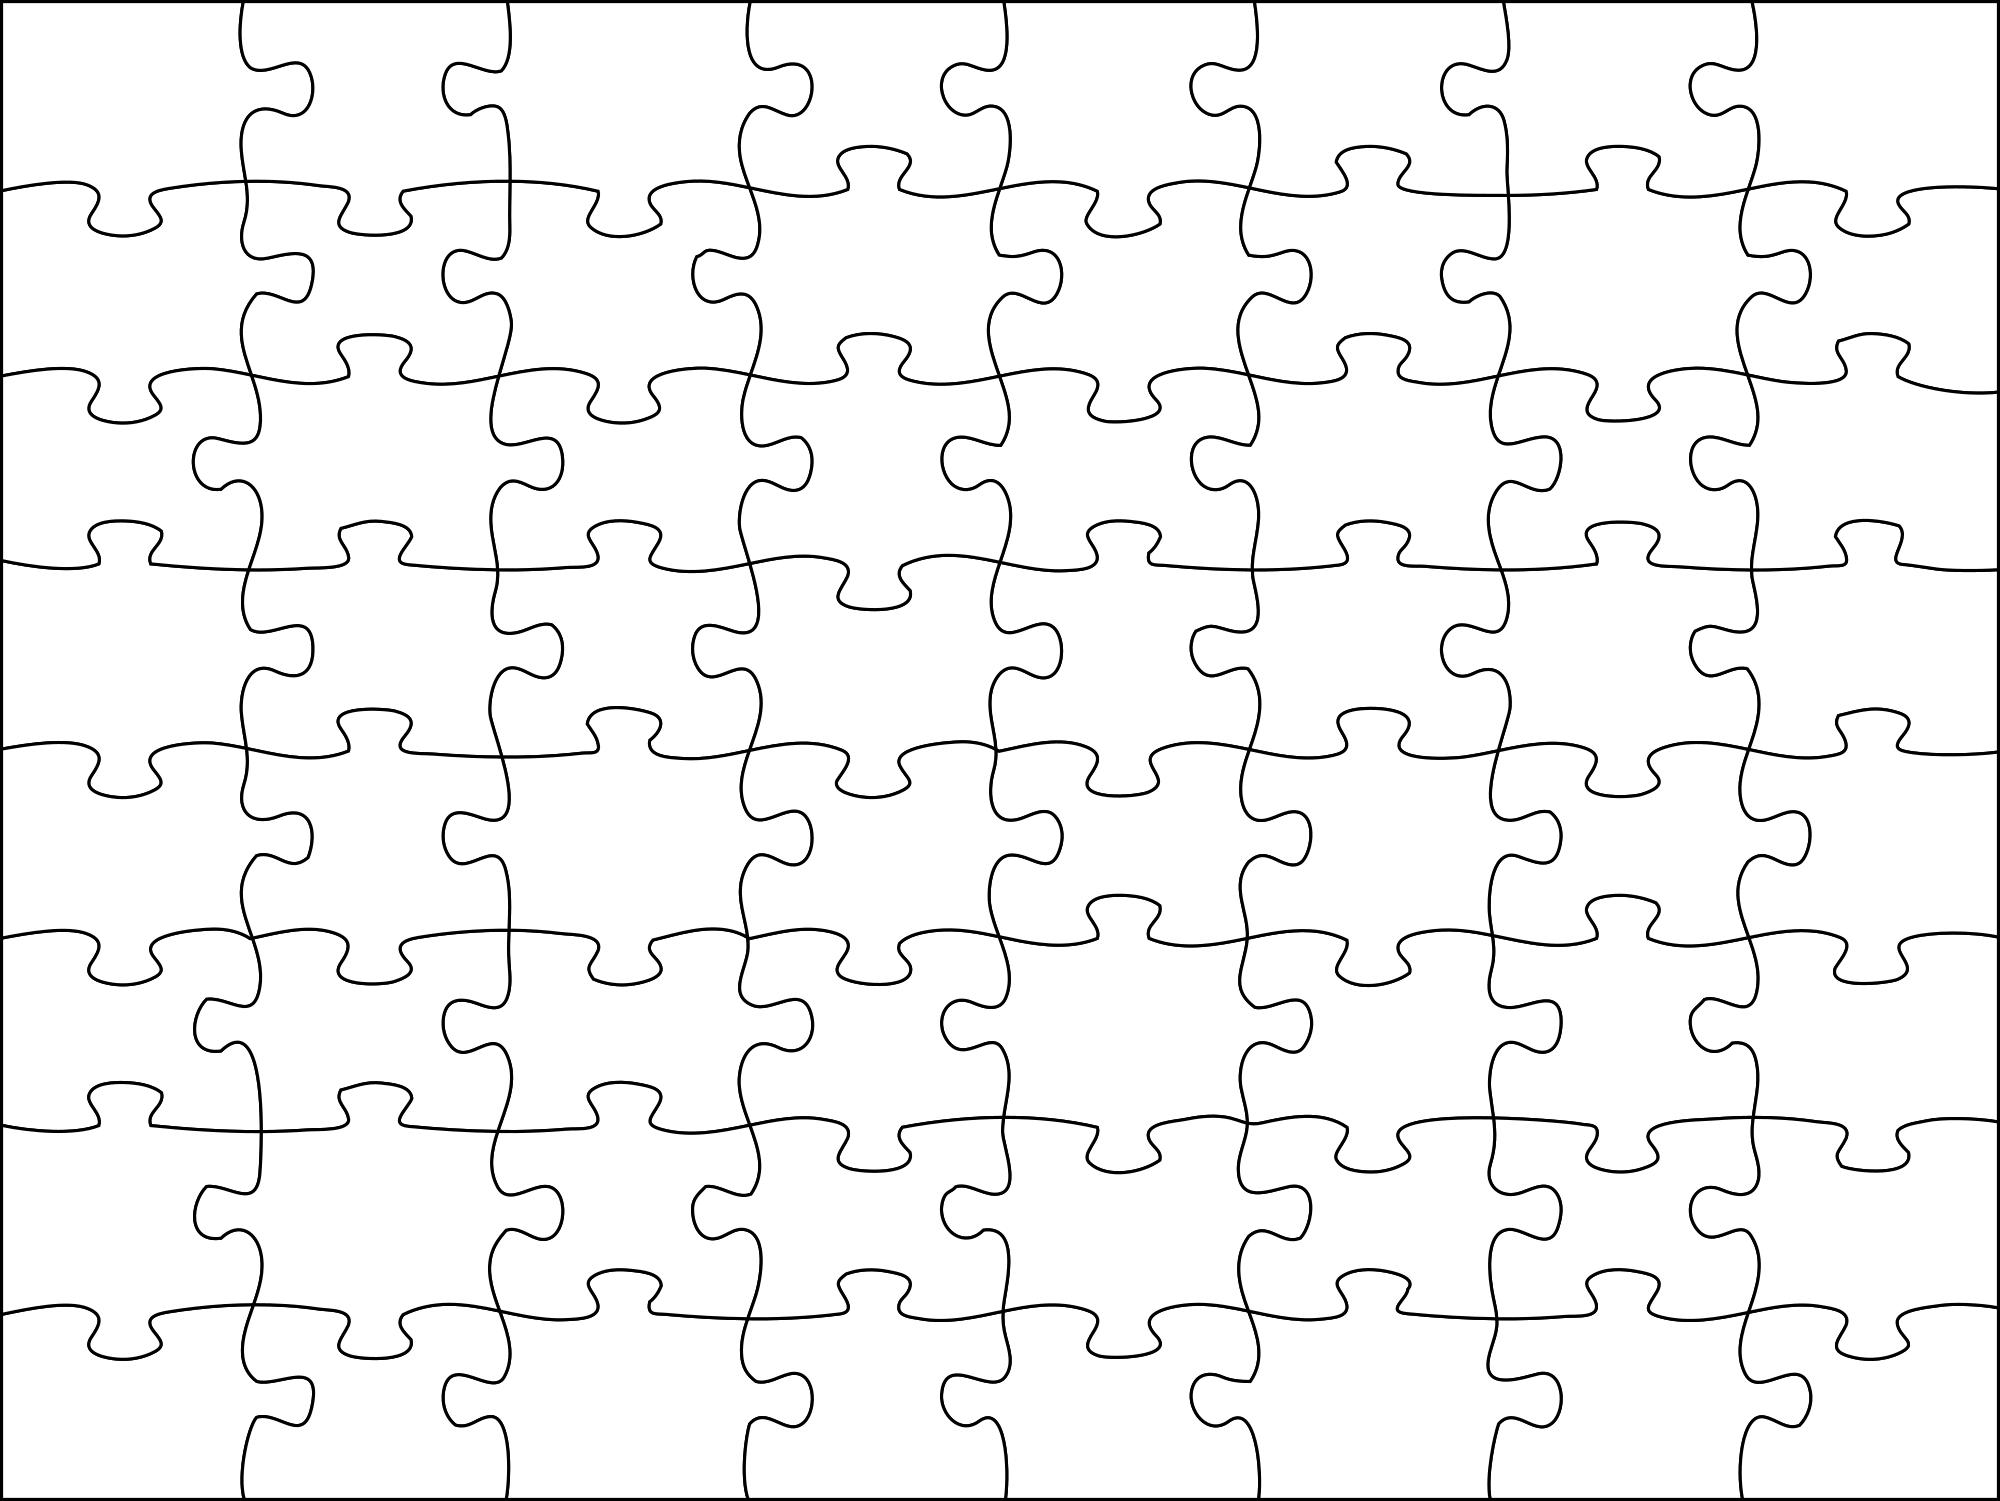 File:Jigsaw Puzzle.svg - Wikimedia Commons